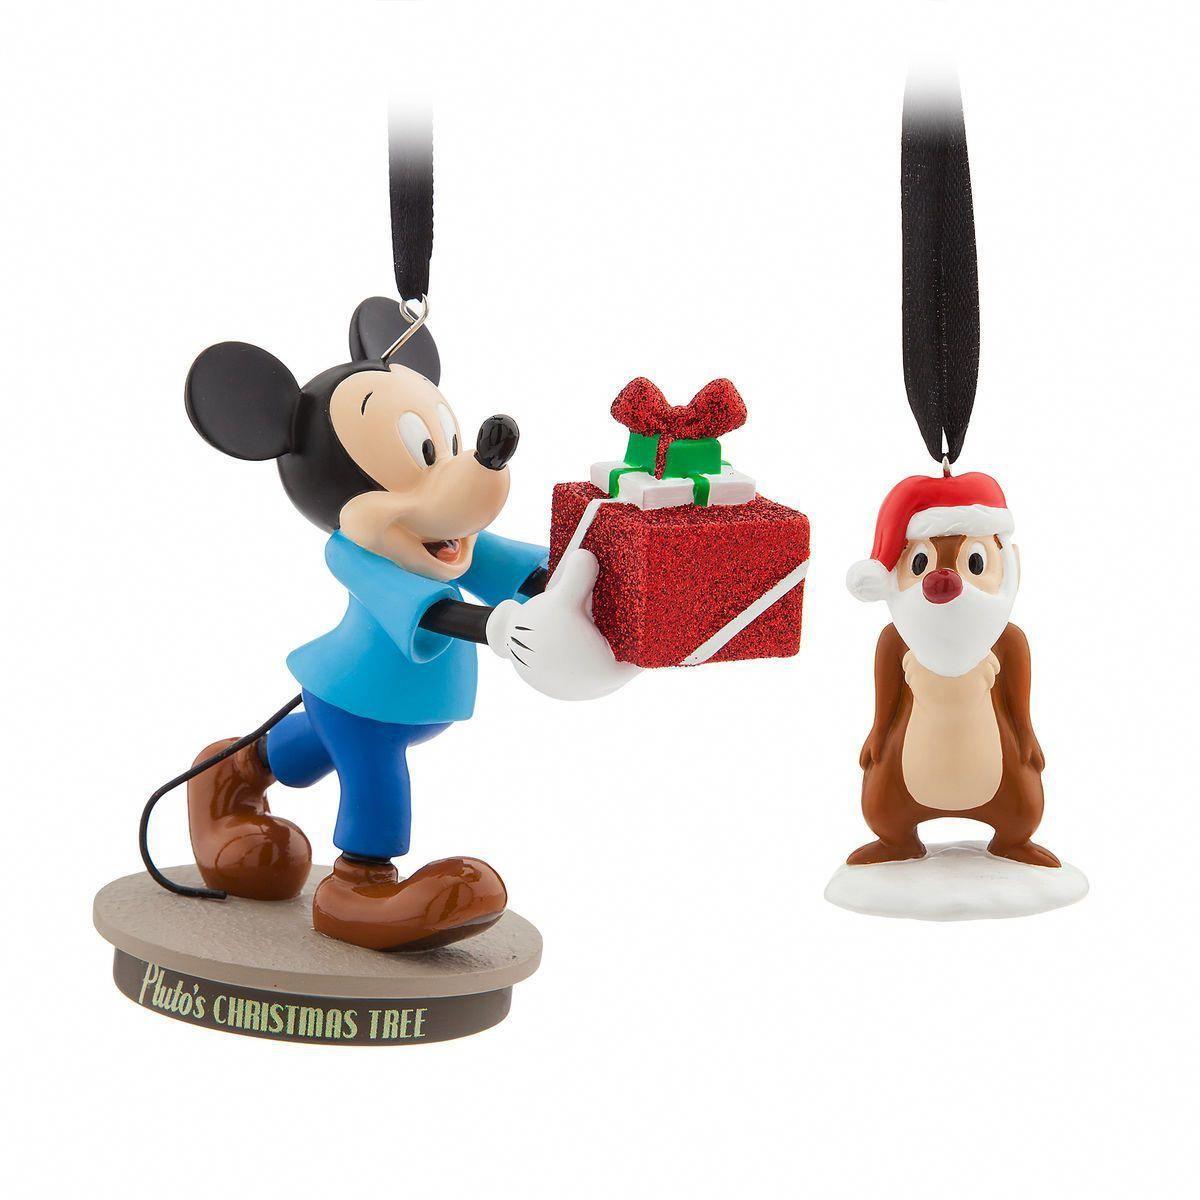 Keepsake Christmas Ornament Hallmark 2010 NEW Two-Gun Mickey Mouse